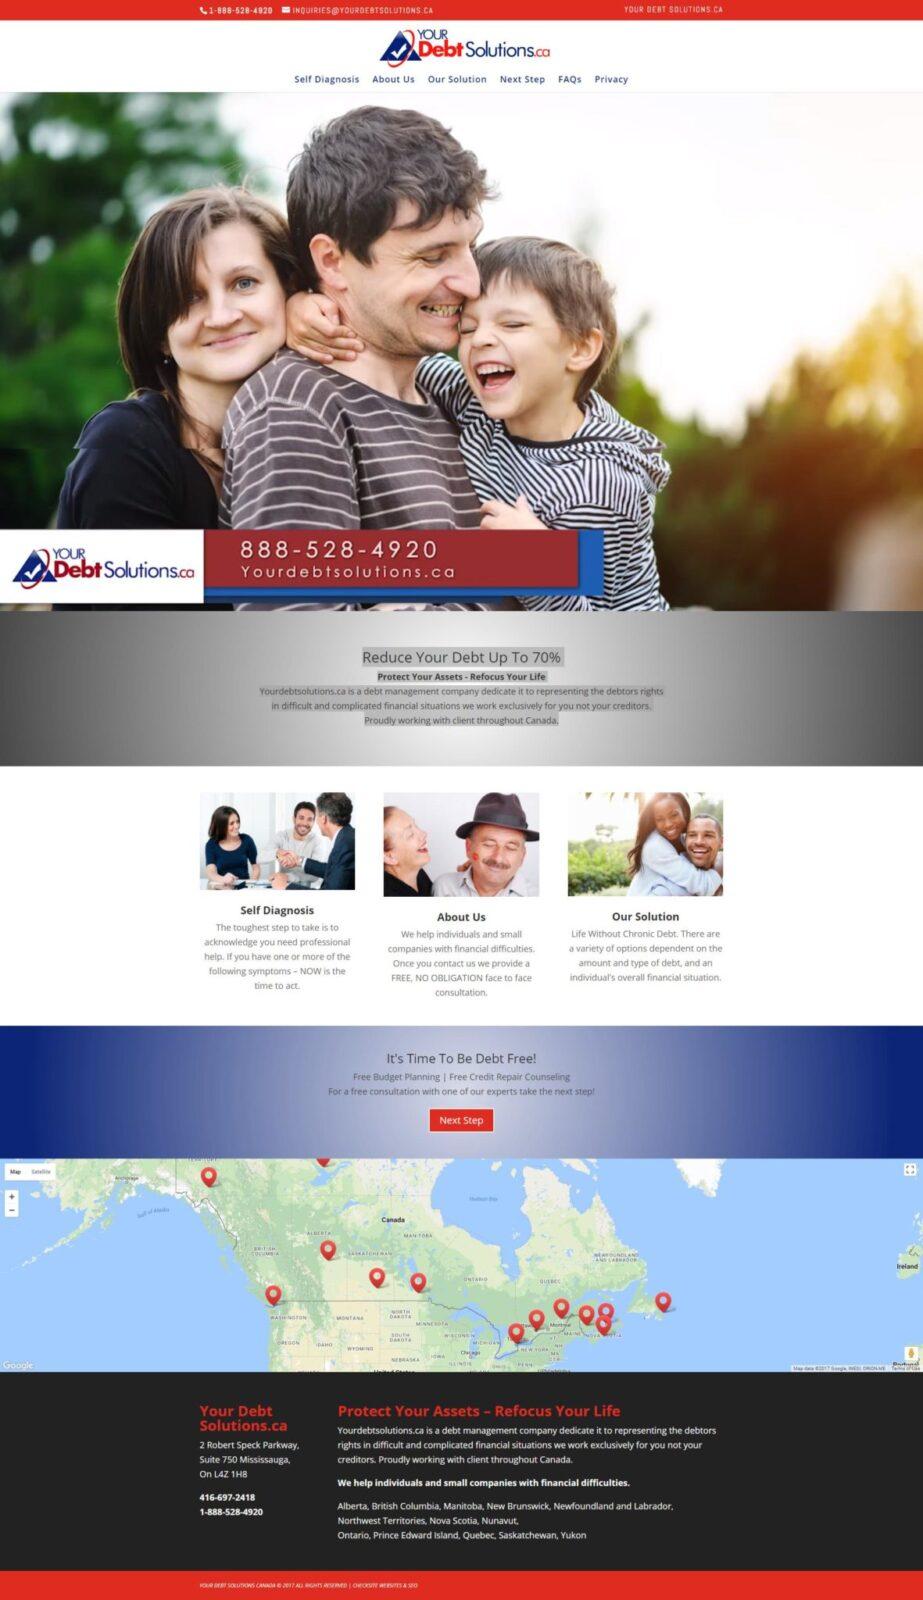 Your Debt Solutions.ca